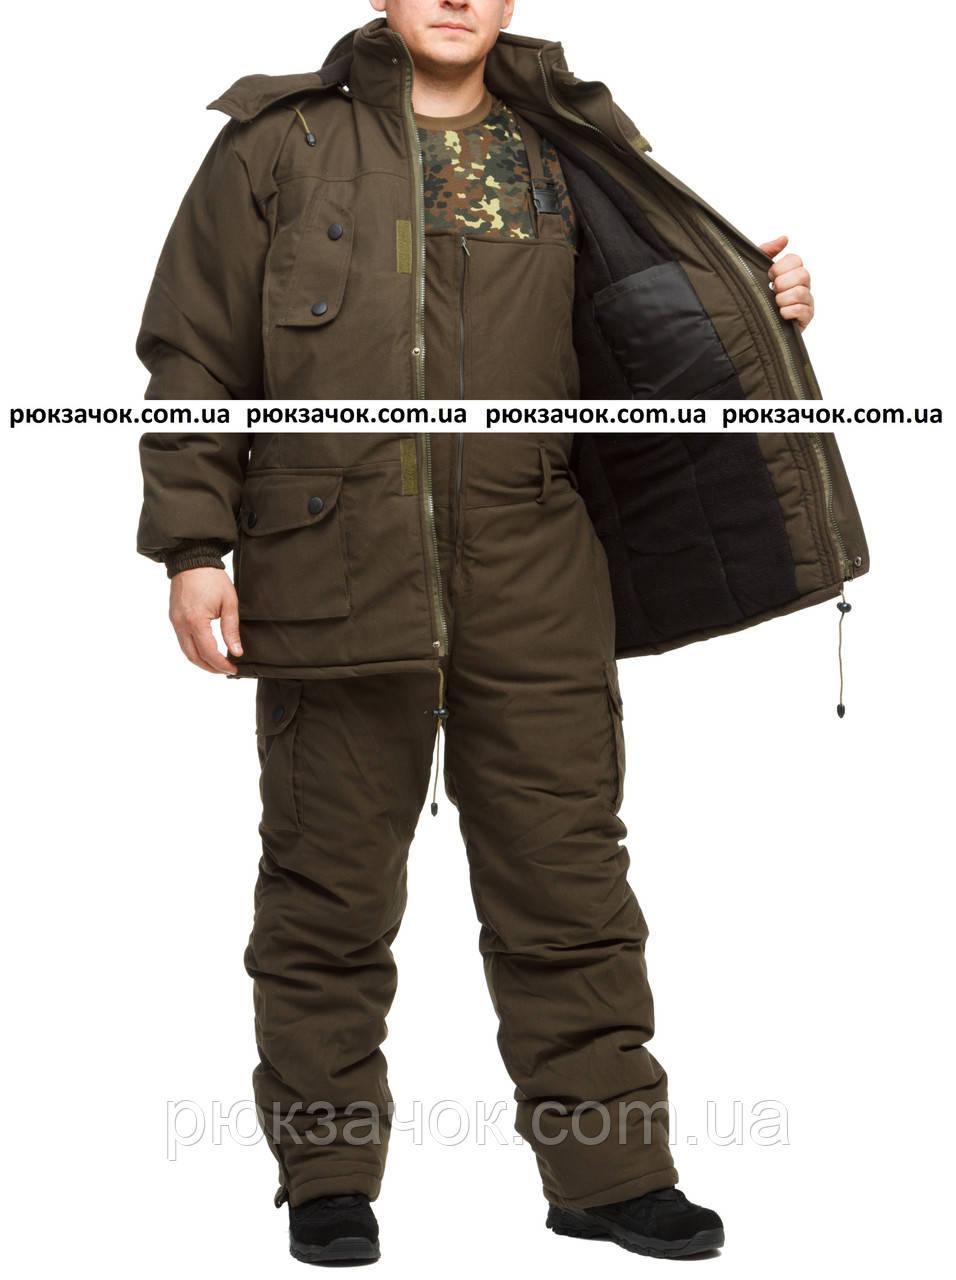 "Костюм для зимней рыбалки ""Олива-хаки"" размер 56-58"